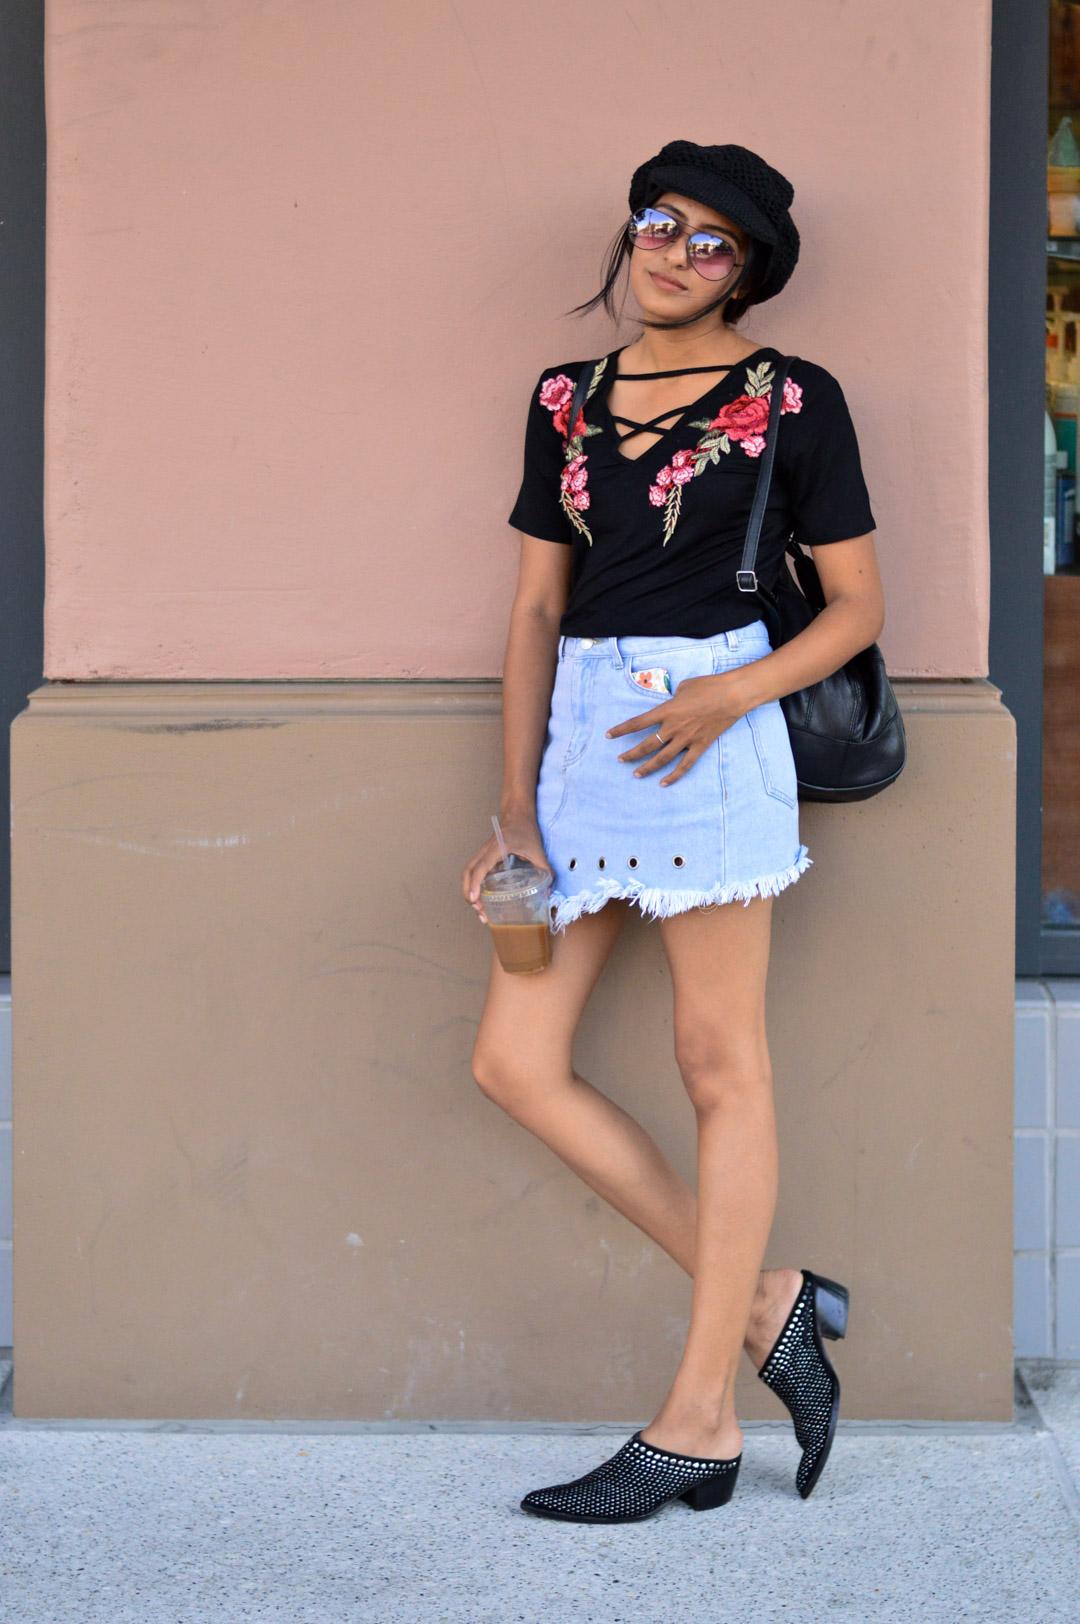 Casual-friday-style-denim-skirt-black-tee-studded-booties 1